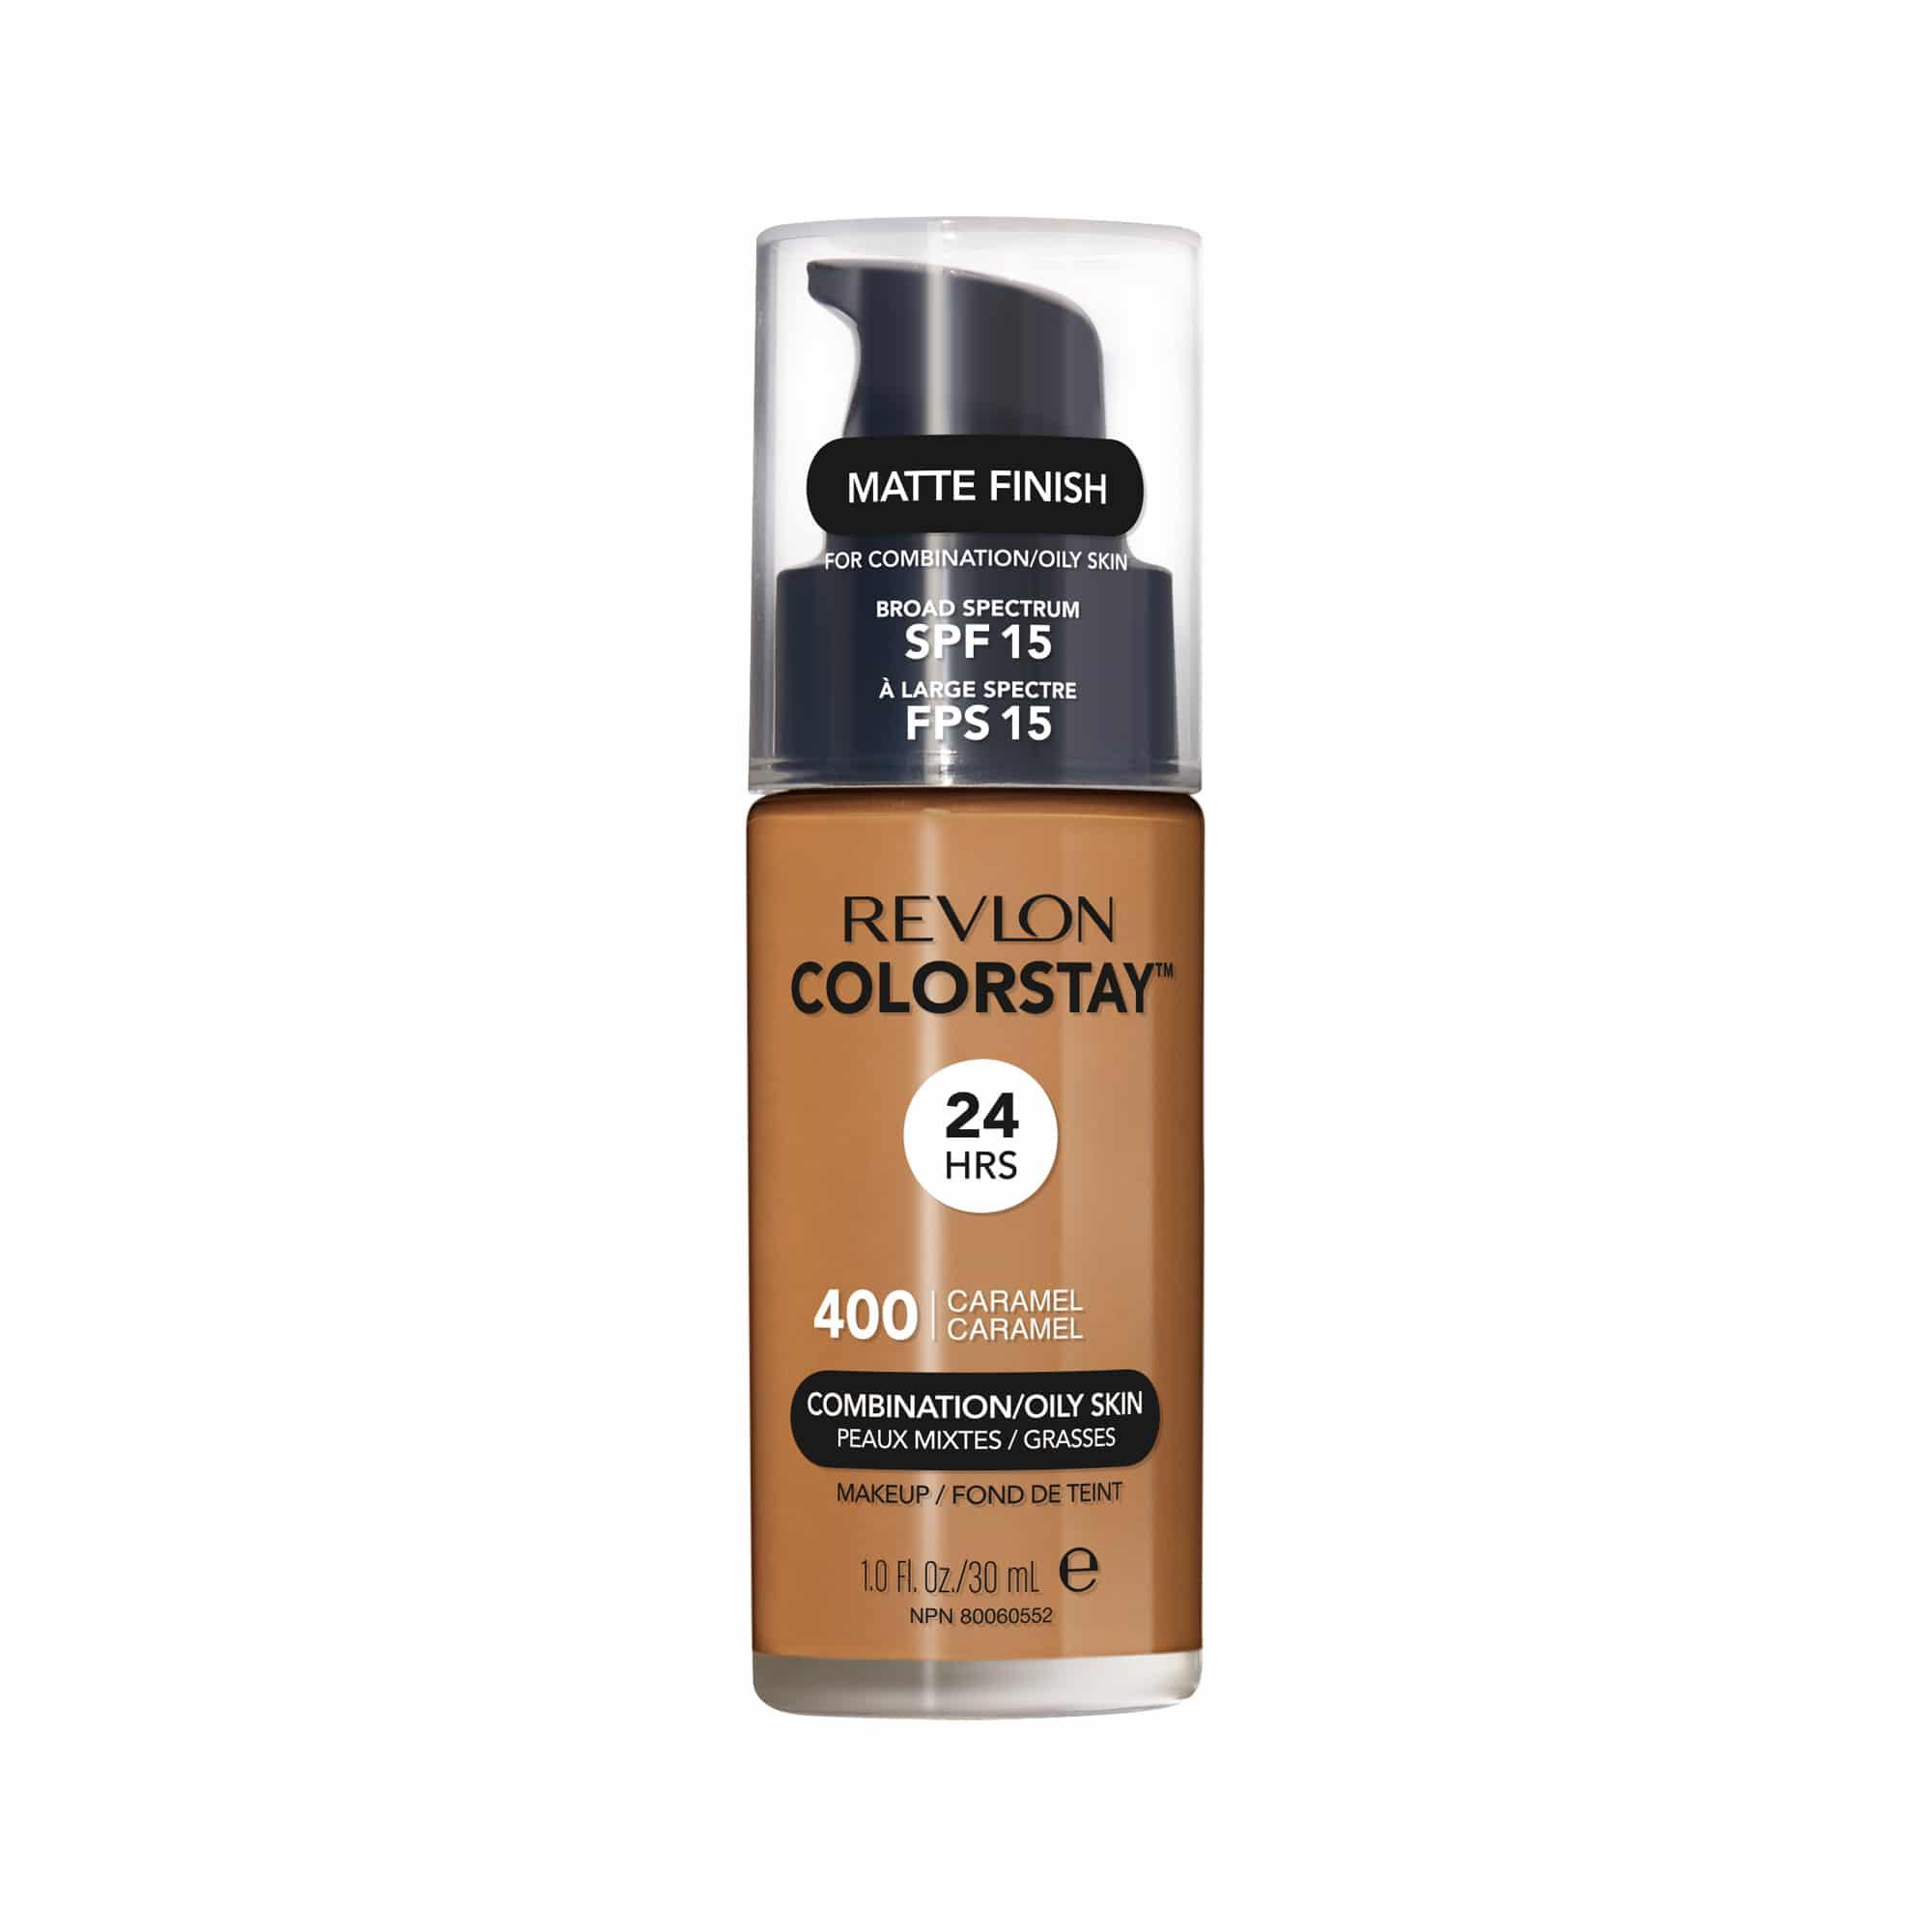 Revlon Colorstay Liquid Foundation Combination Oily Skin Spf 15 Evoke Grenada